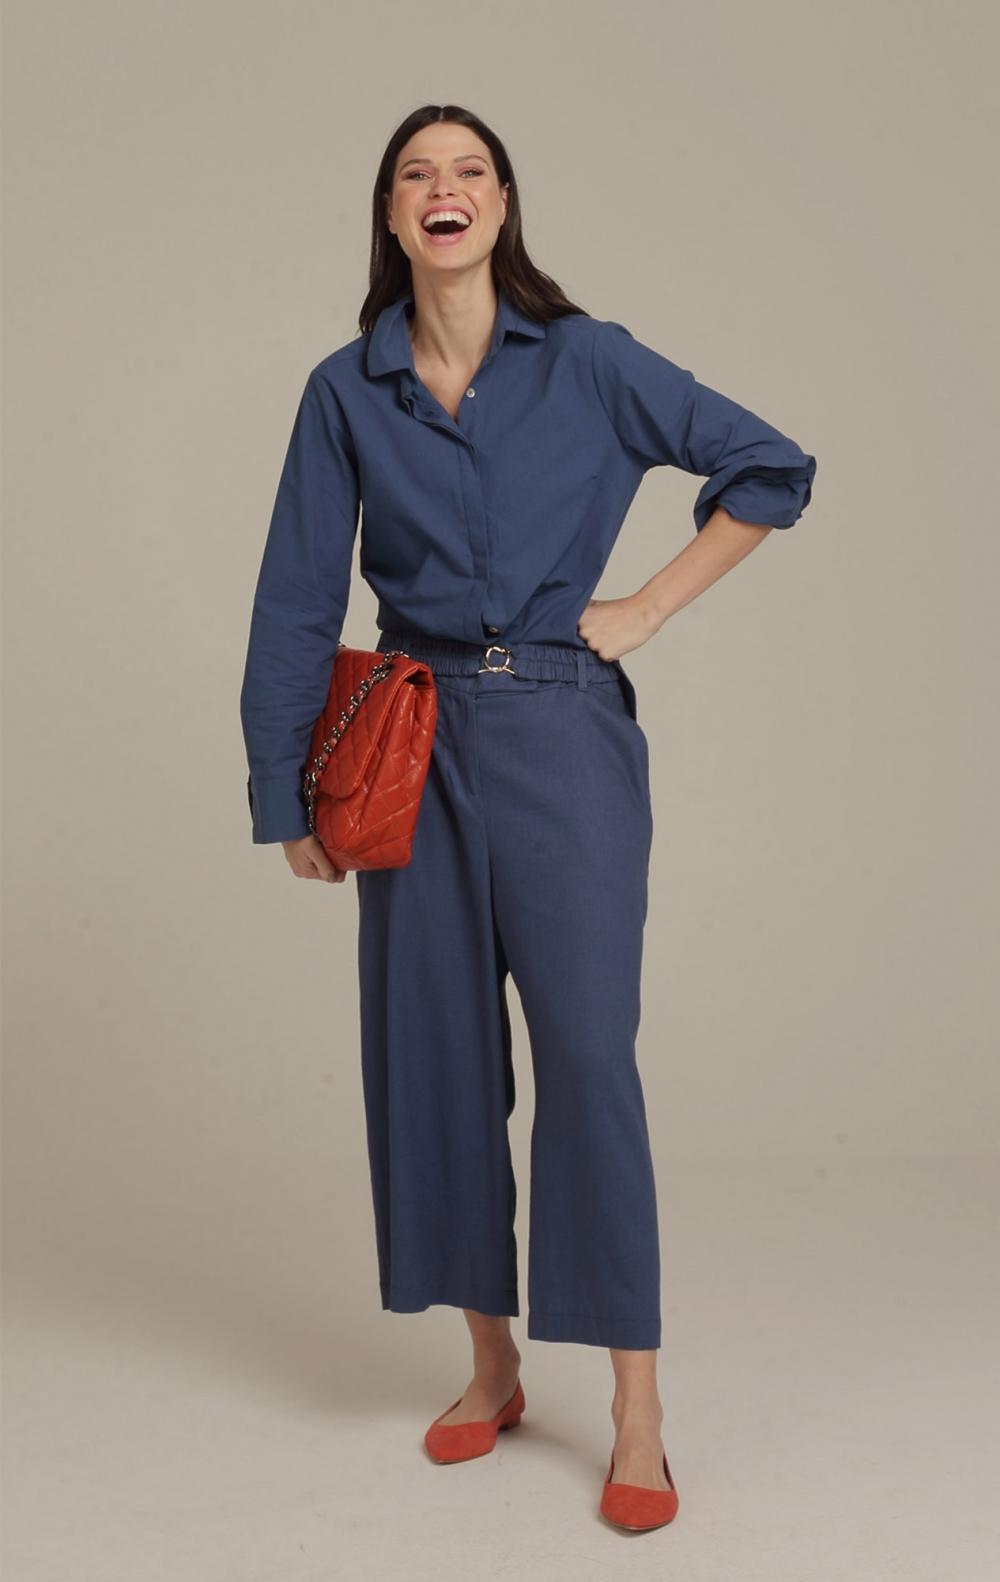 Calça AG Pantacourt Blue Jeans - Foto 2